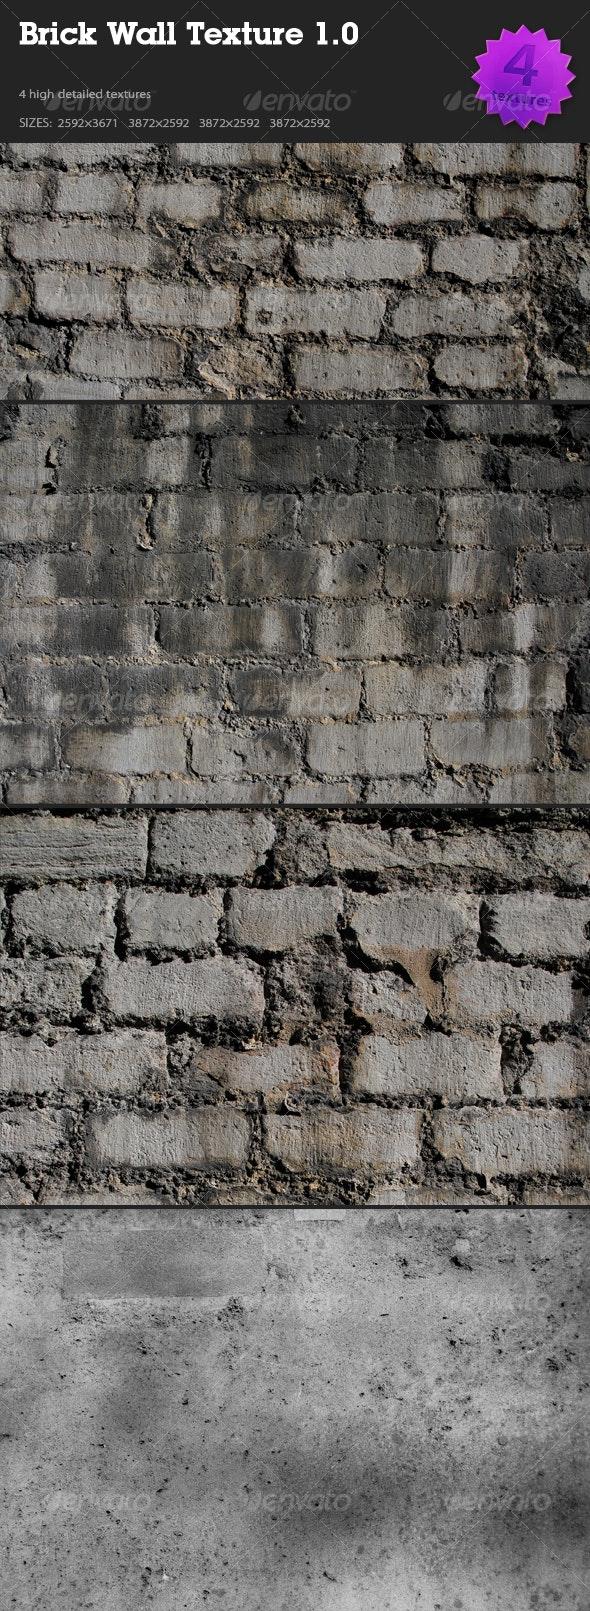 Brick Wall Texture 1.0 - Stone Textures